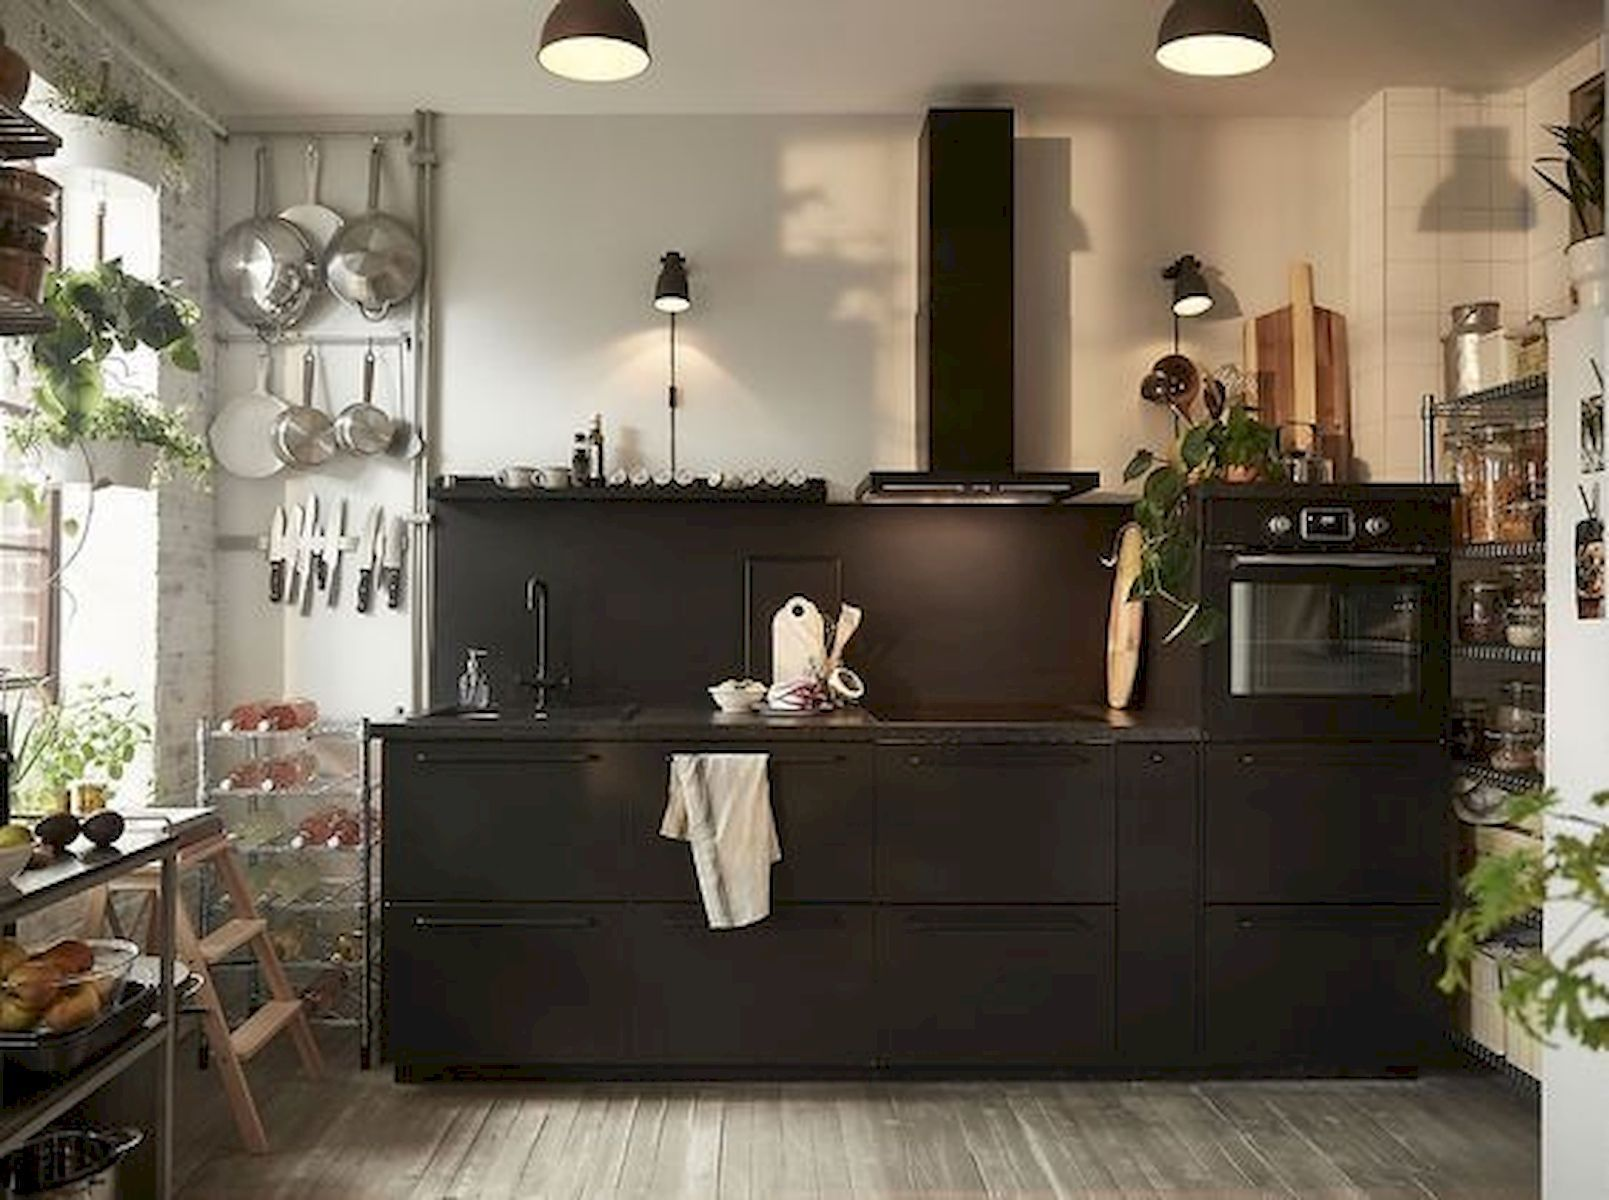 30 Amazing Black Kitchen Ideas You Will Love Ikea